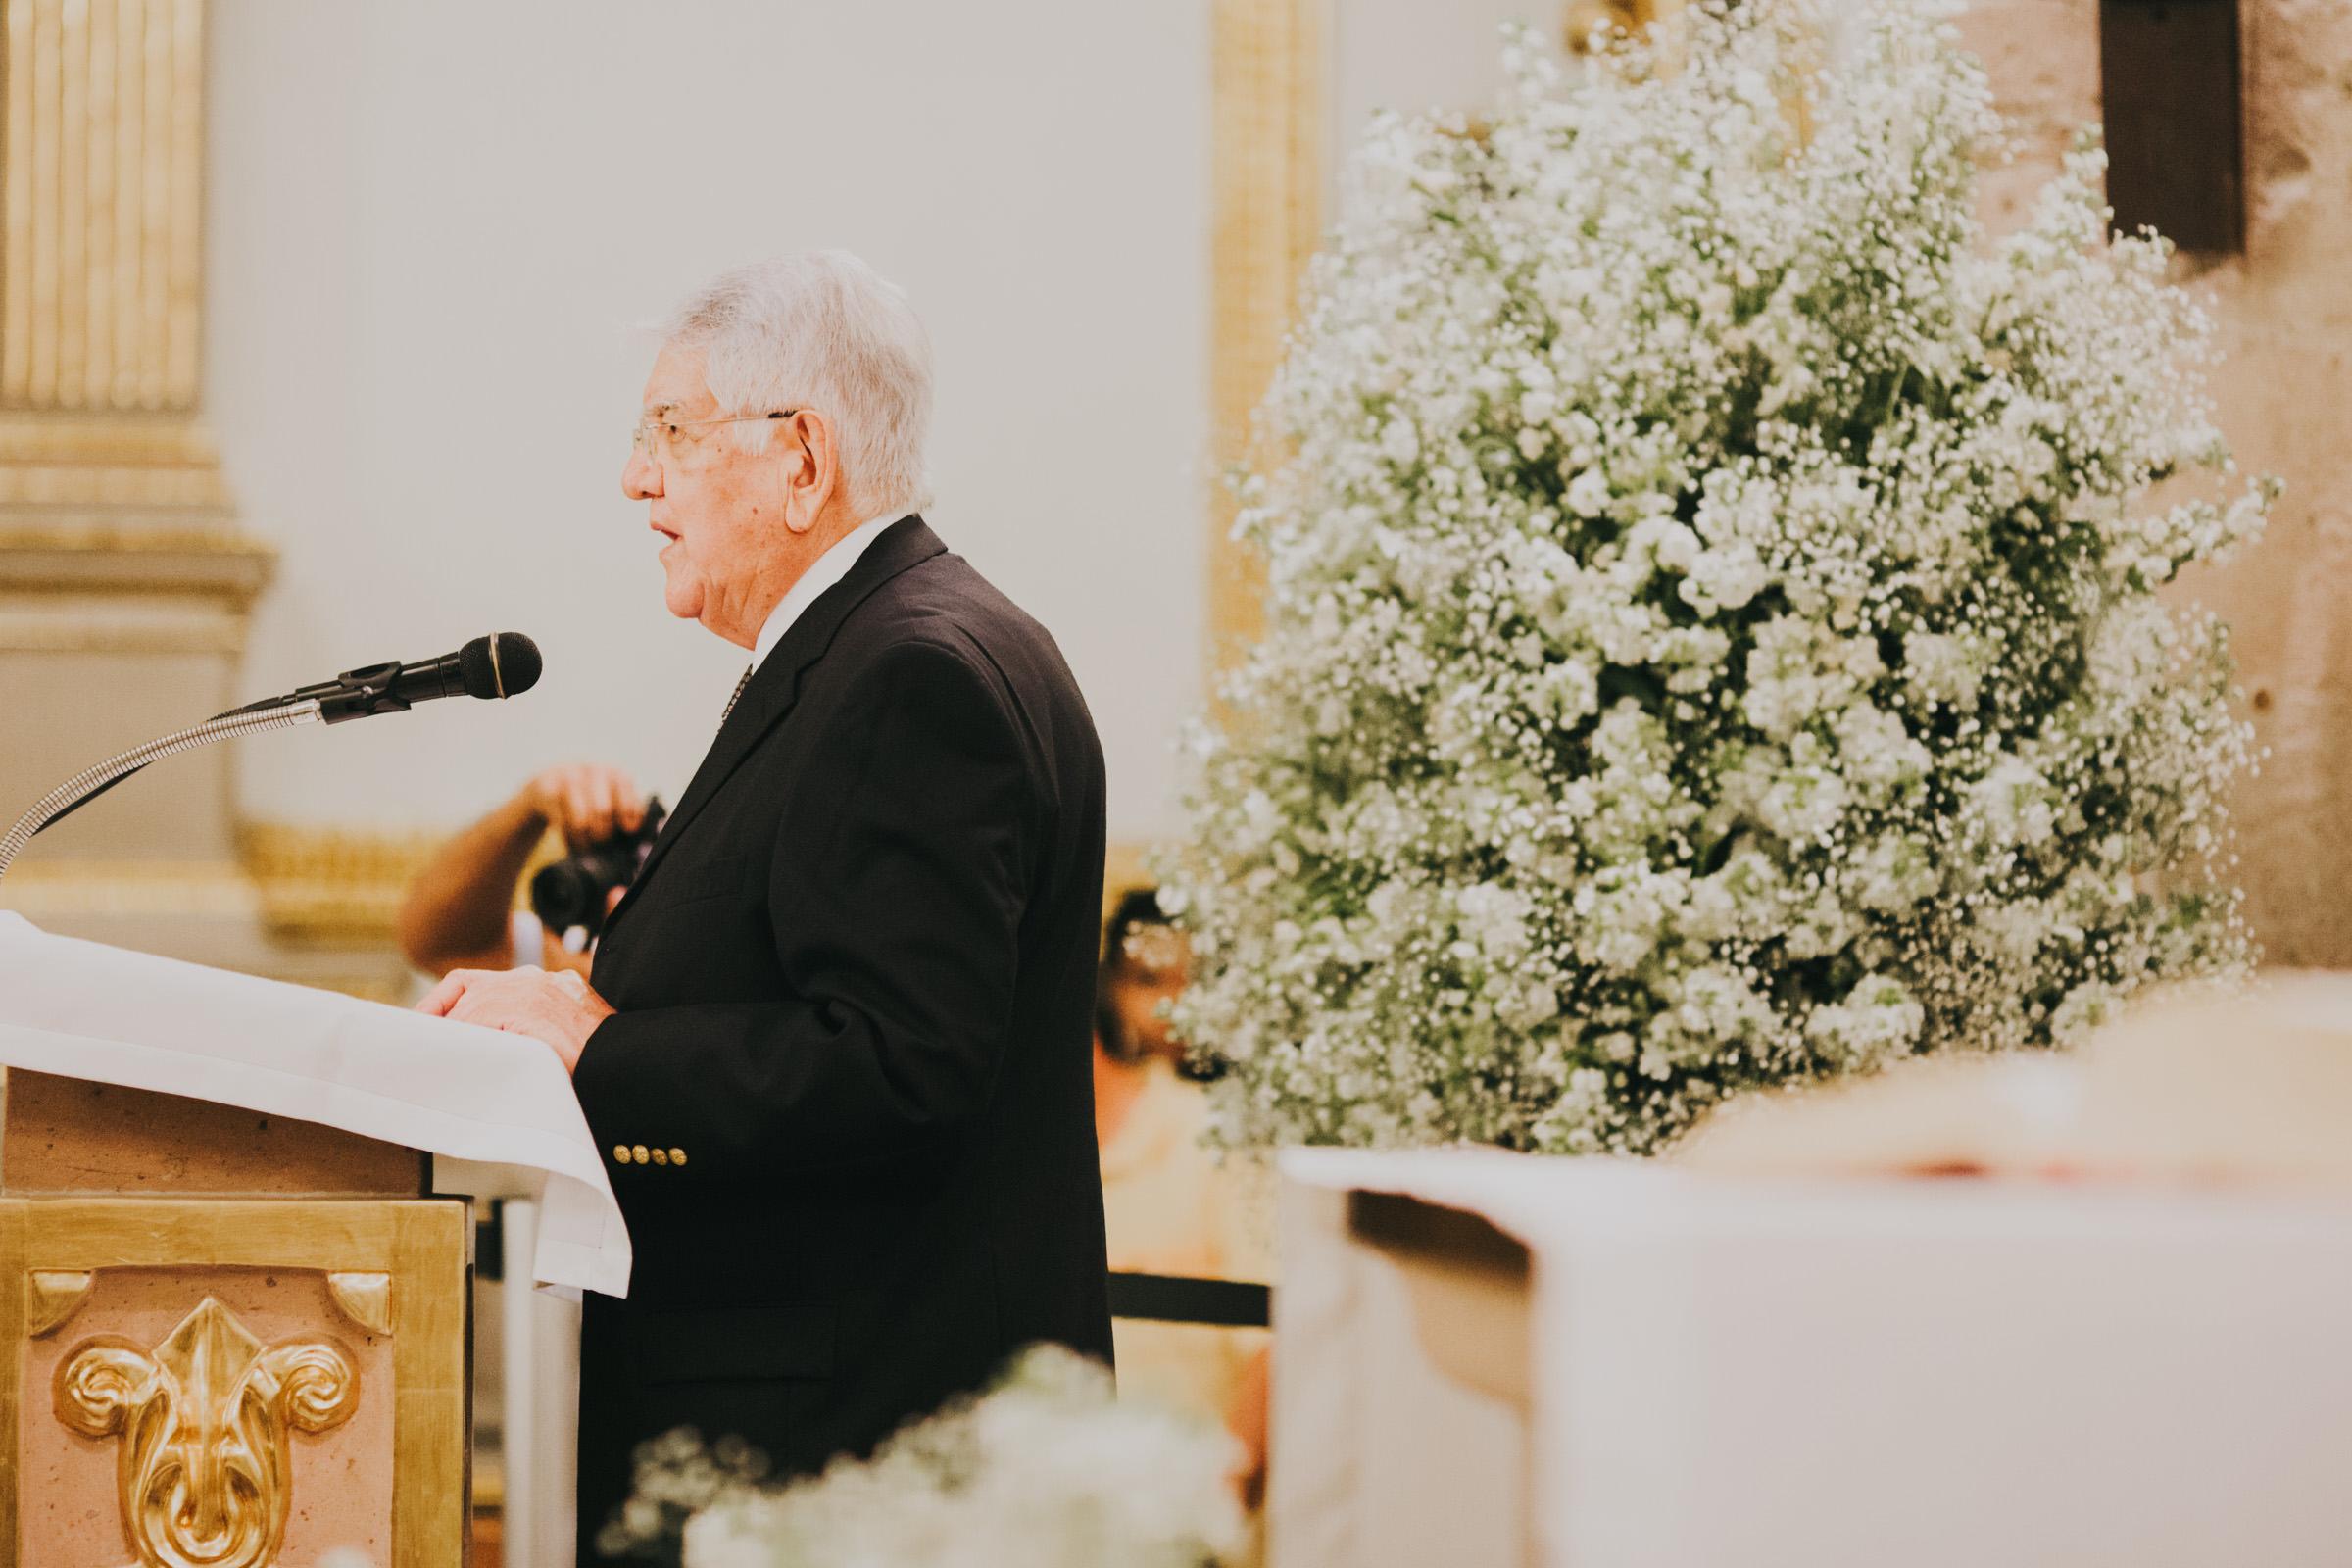 irapuato-boda-fotografia-jardines-alcalde-guanajuato-paulina-juan-pedro--108.jpg